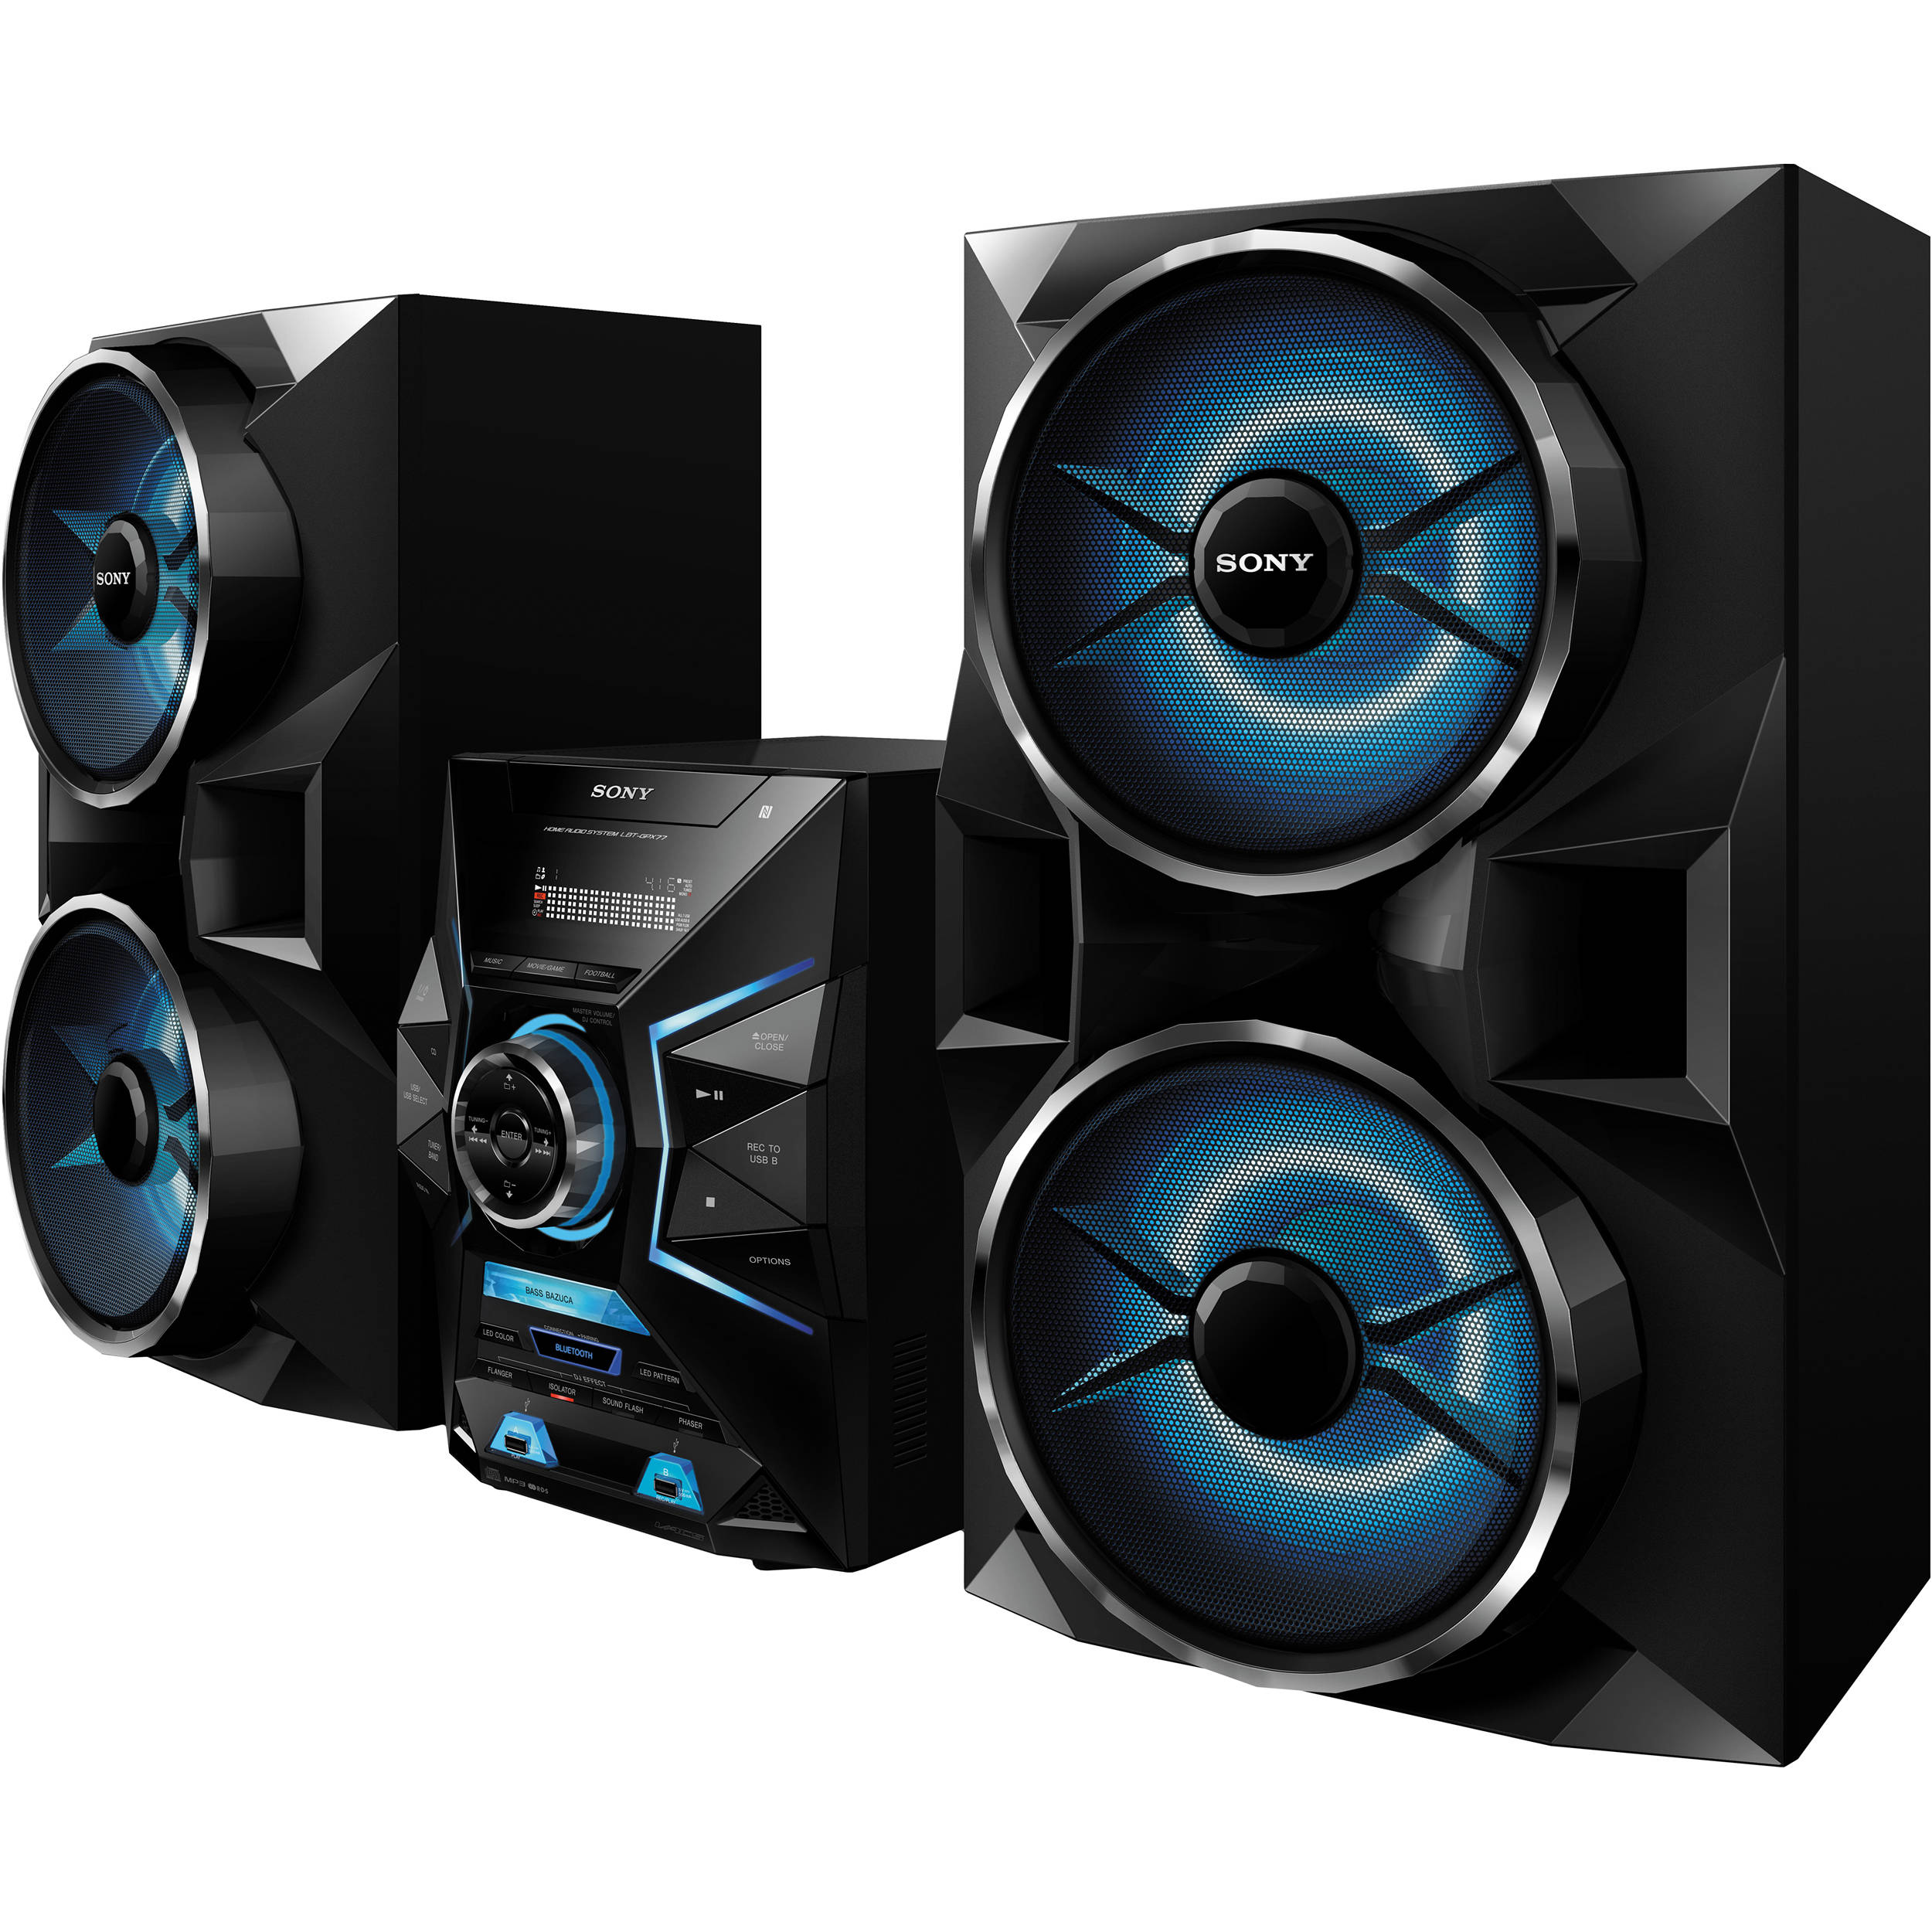 761dca1e10c Sony LBT-GPX77 1800W Bluetooth Mini System (Black) LBT-GPX77 B H